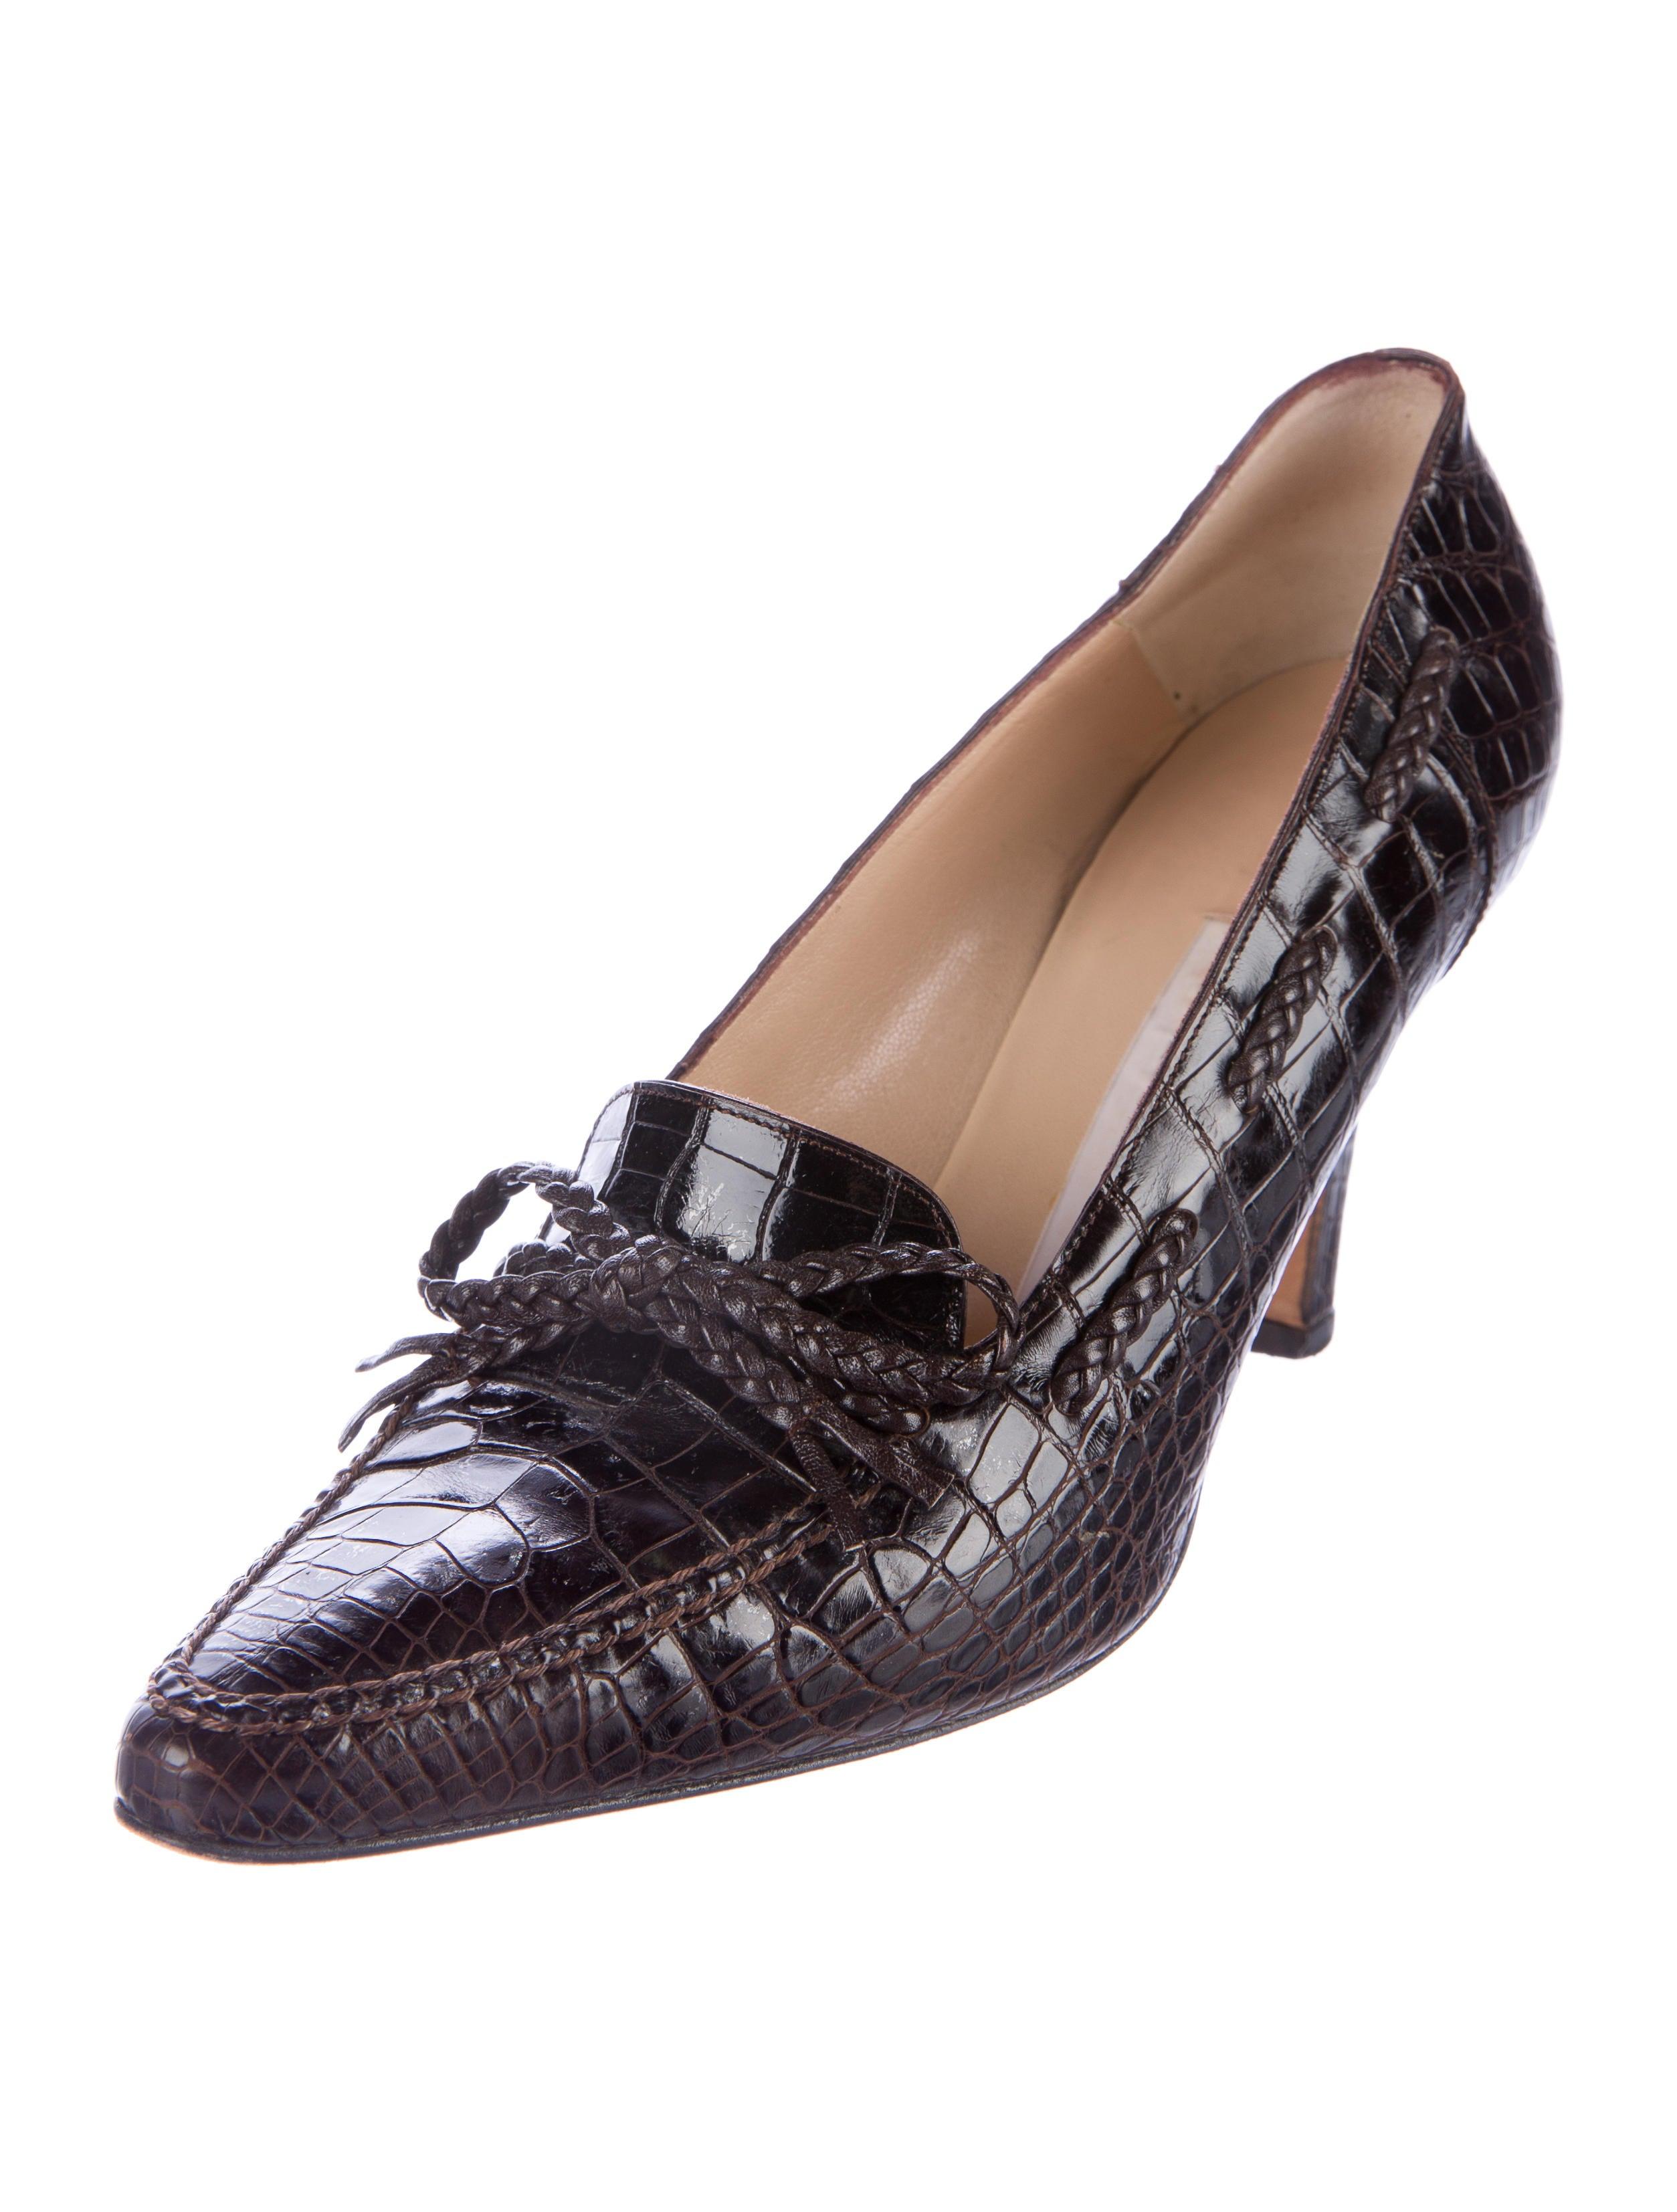 Manolo Blahnik Bow Accented Alligator Pumps Shoes